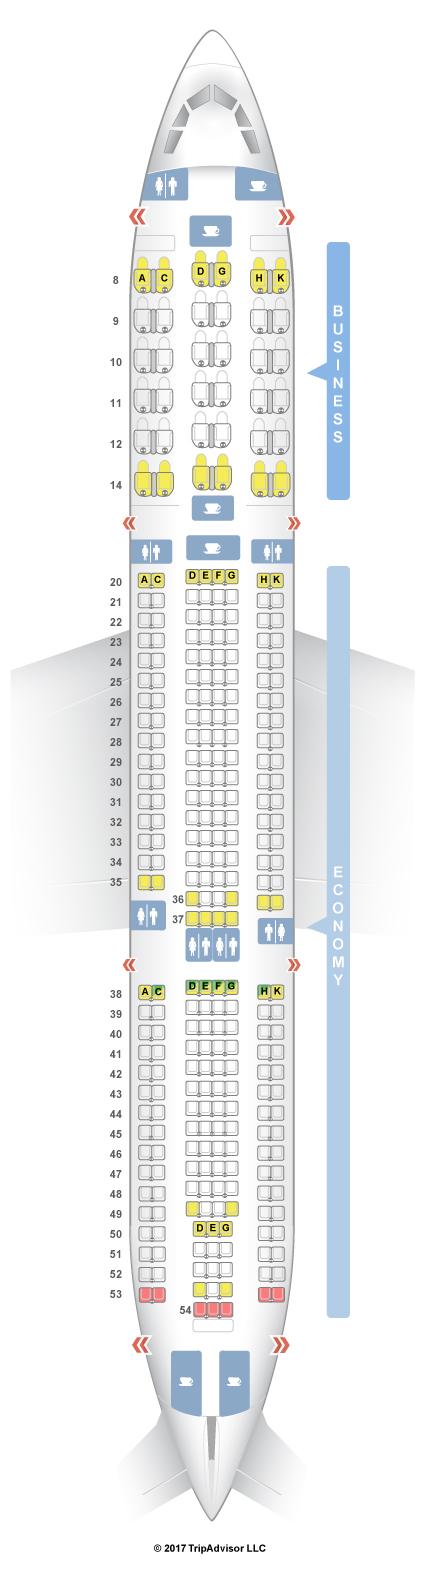 Seatguru Seat Map Egyptair Airbus A330 300 333